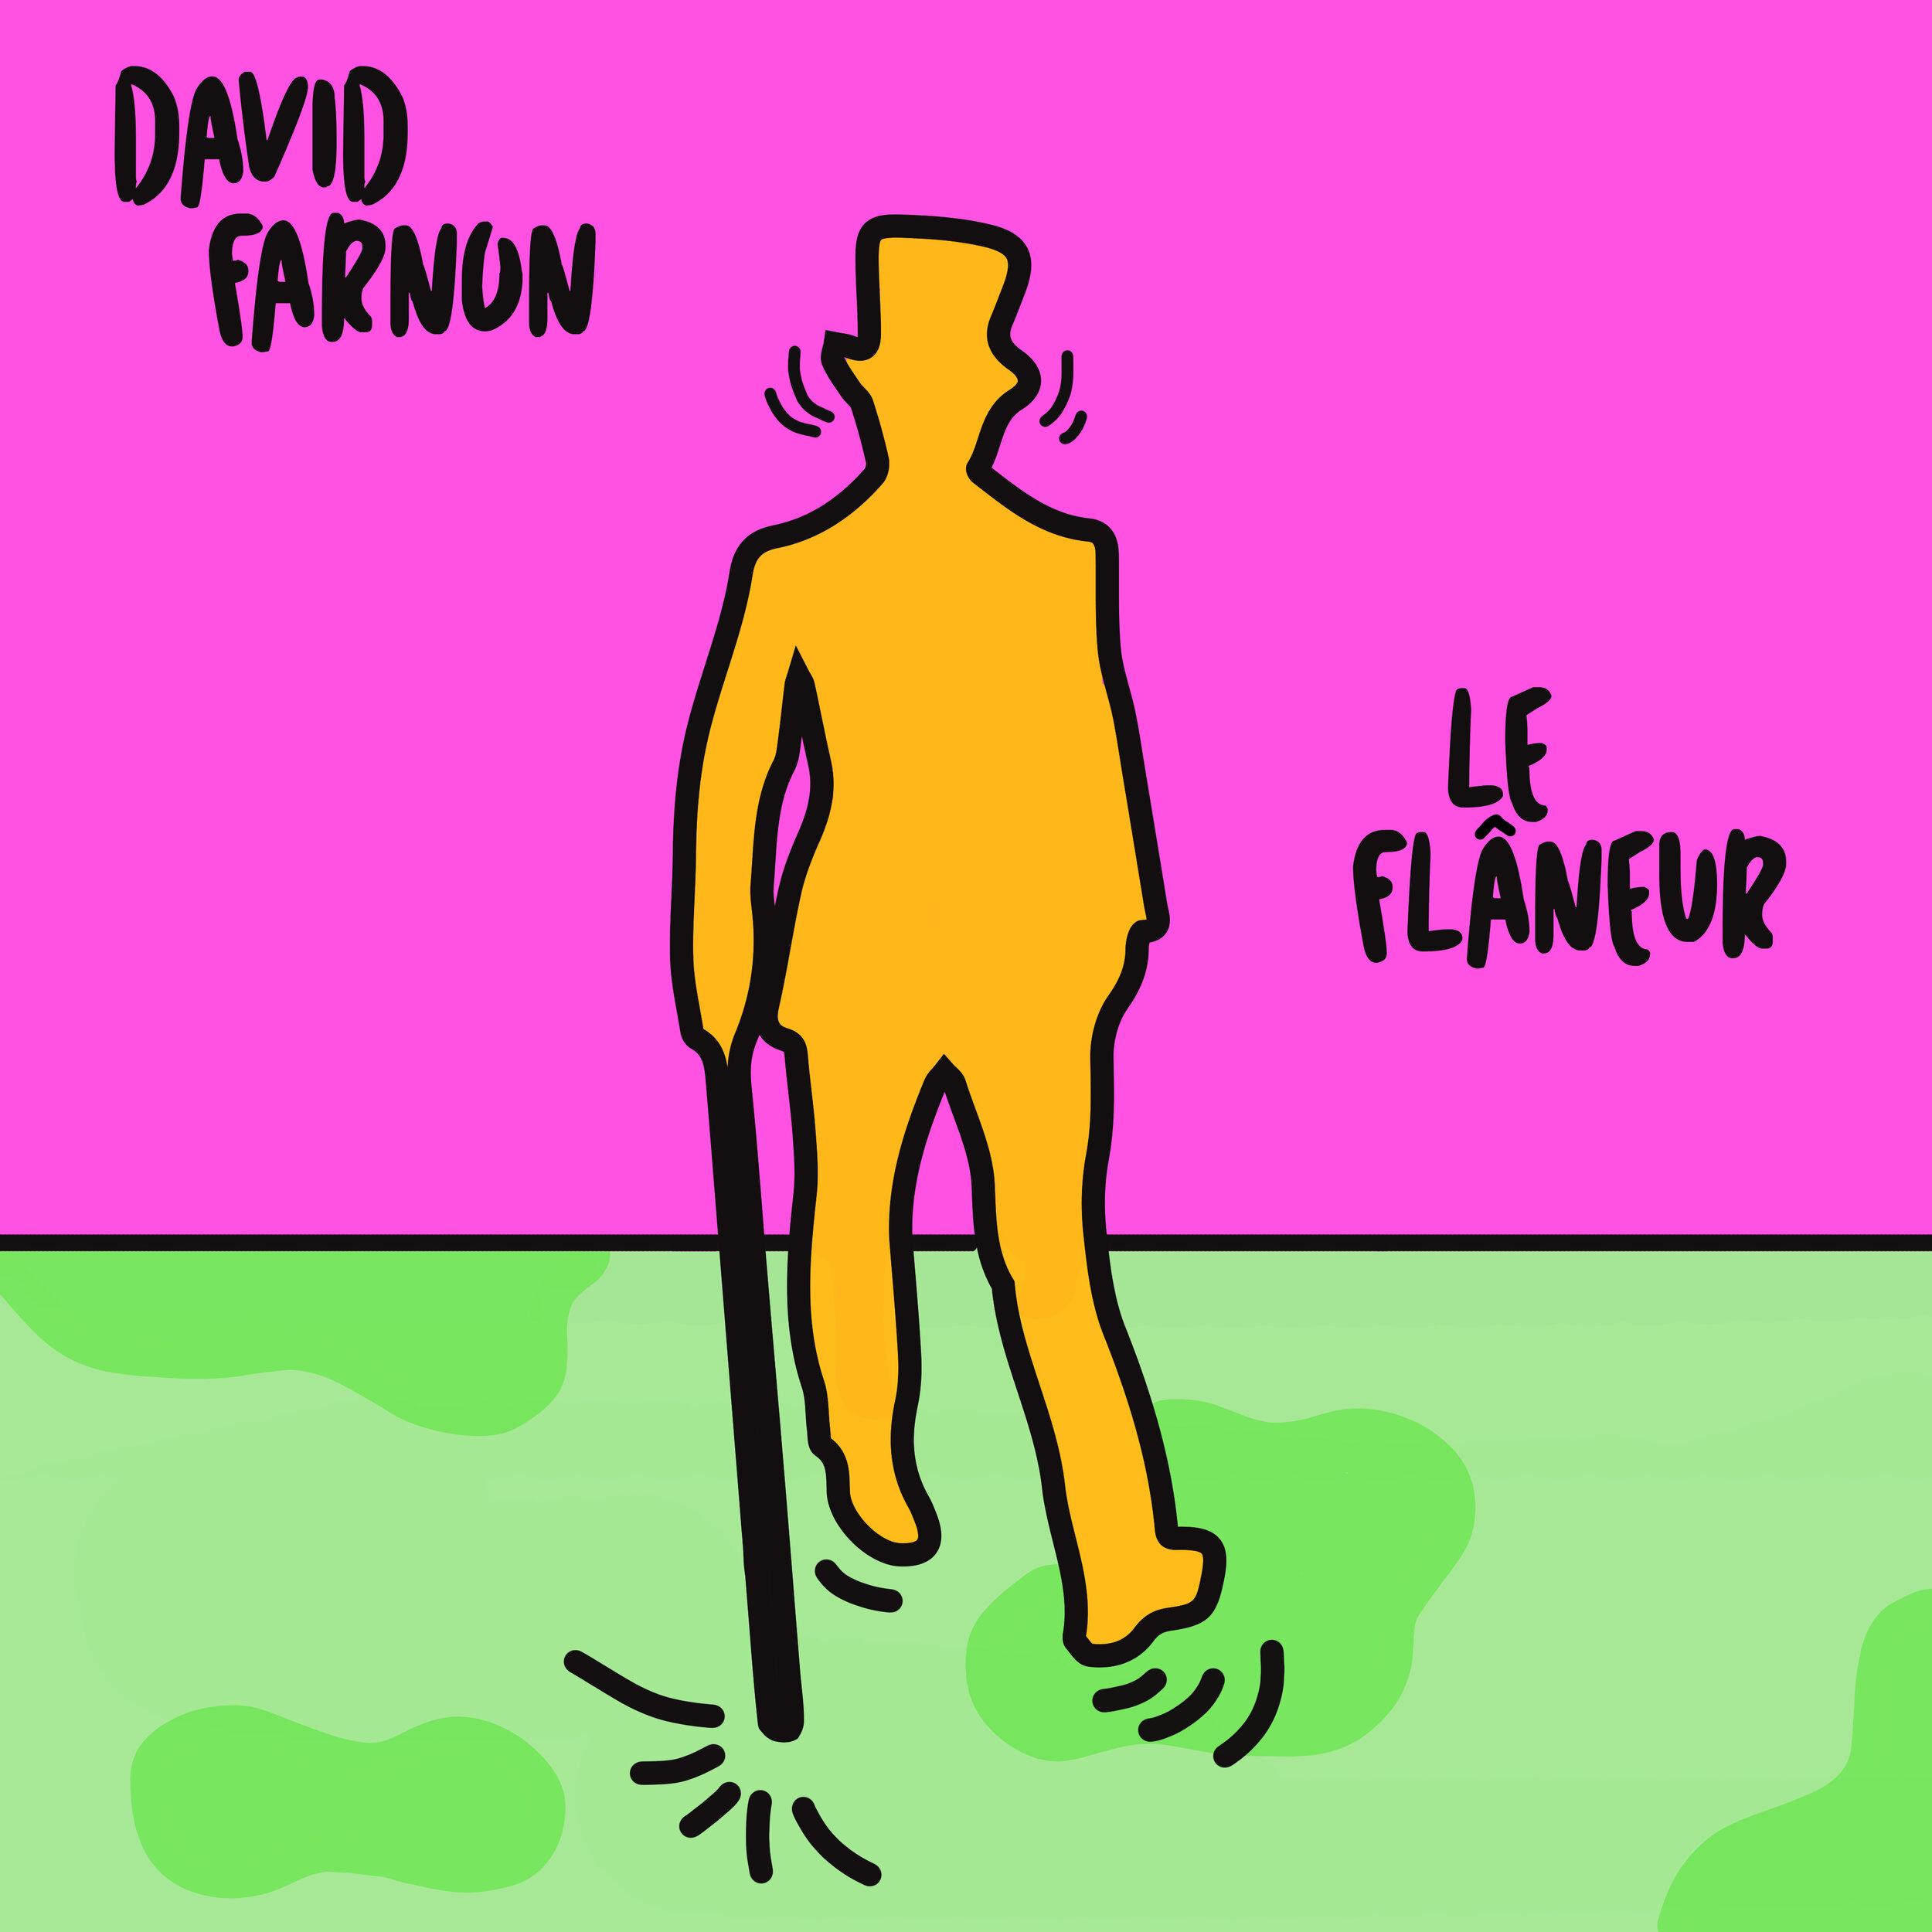 Le Flaneur | David Farnon (2019) -